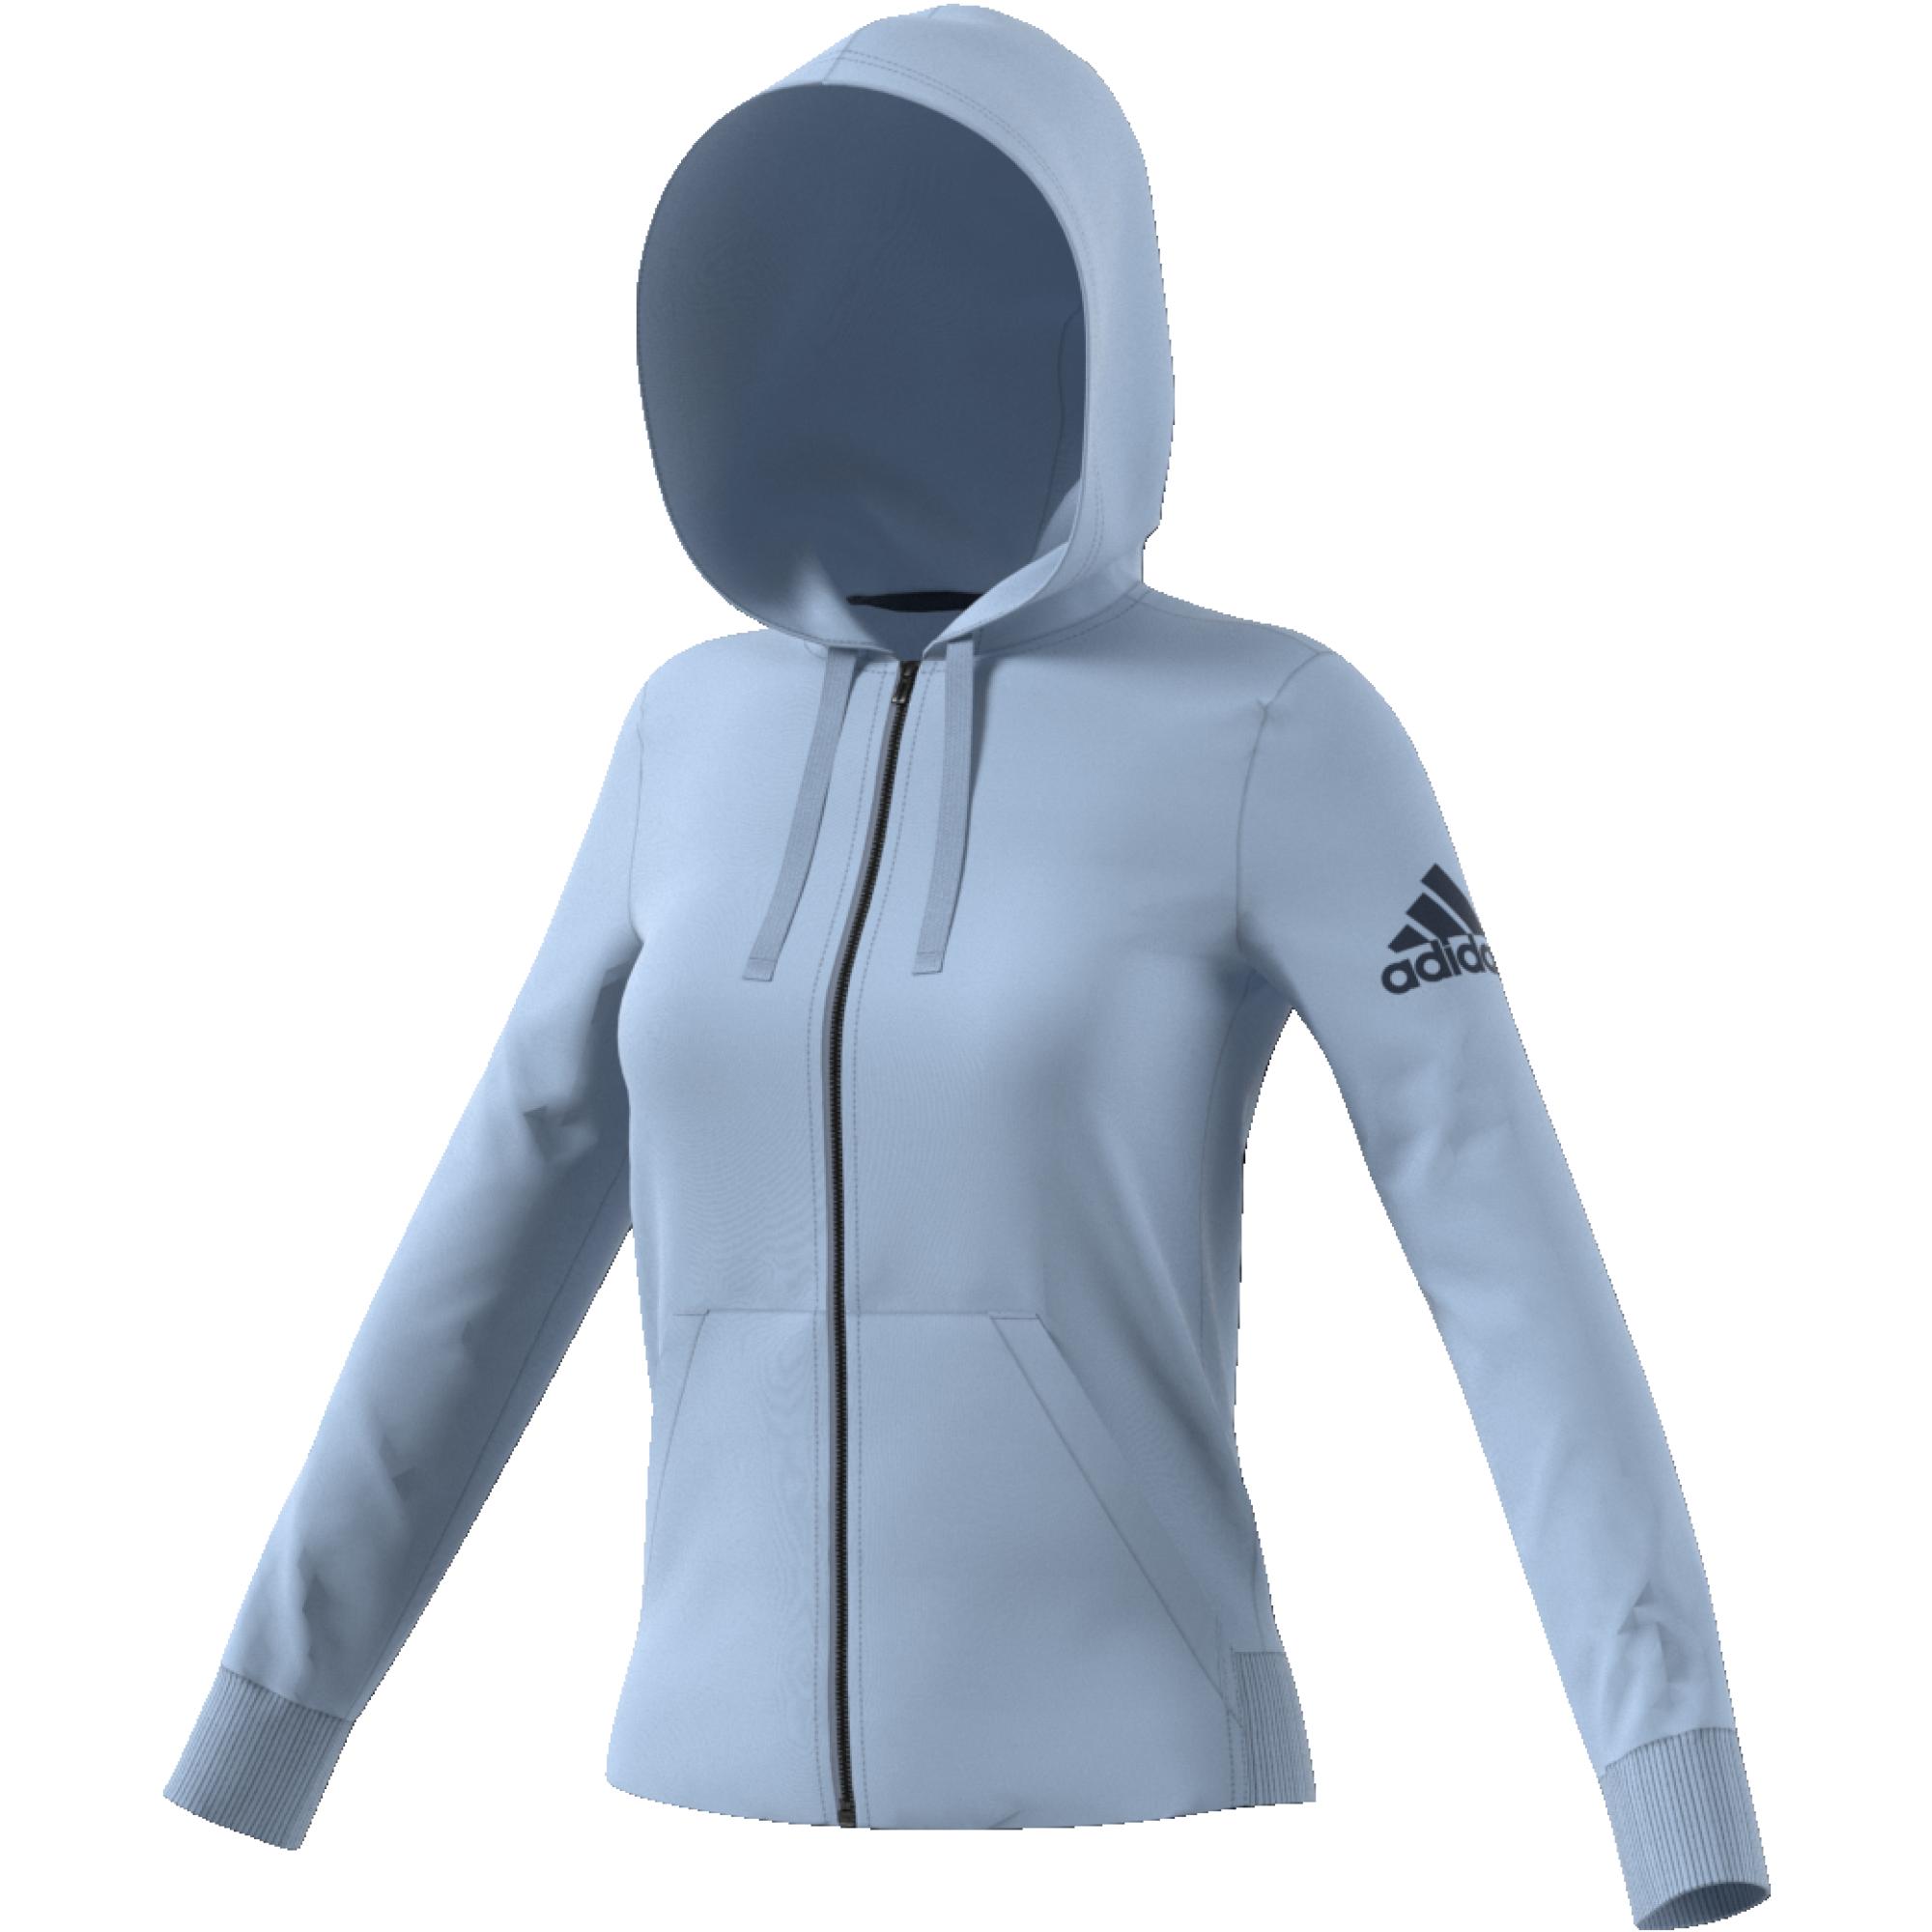 2f4f704ba0 Adidas pulóver , Női ruházat | pulóver , adidas_performance , Adidas pulóver